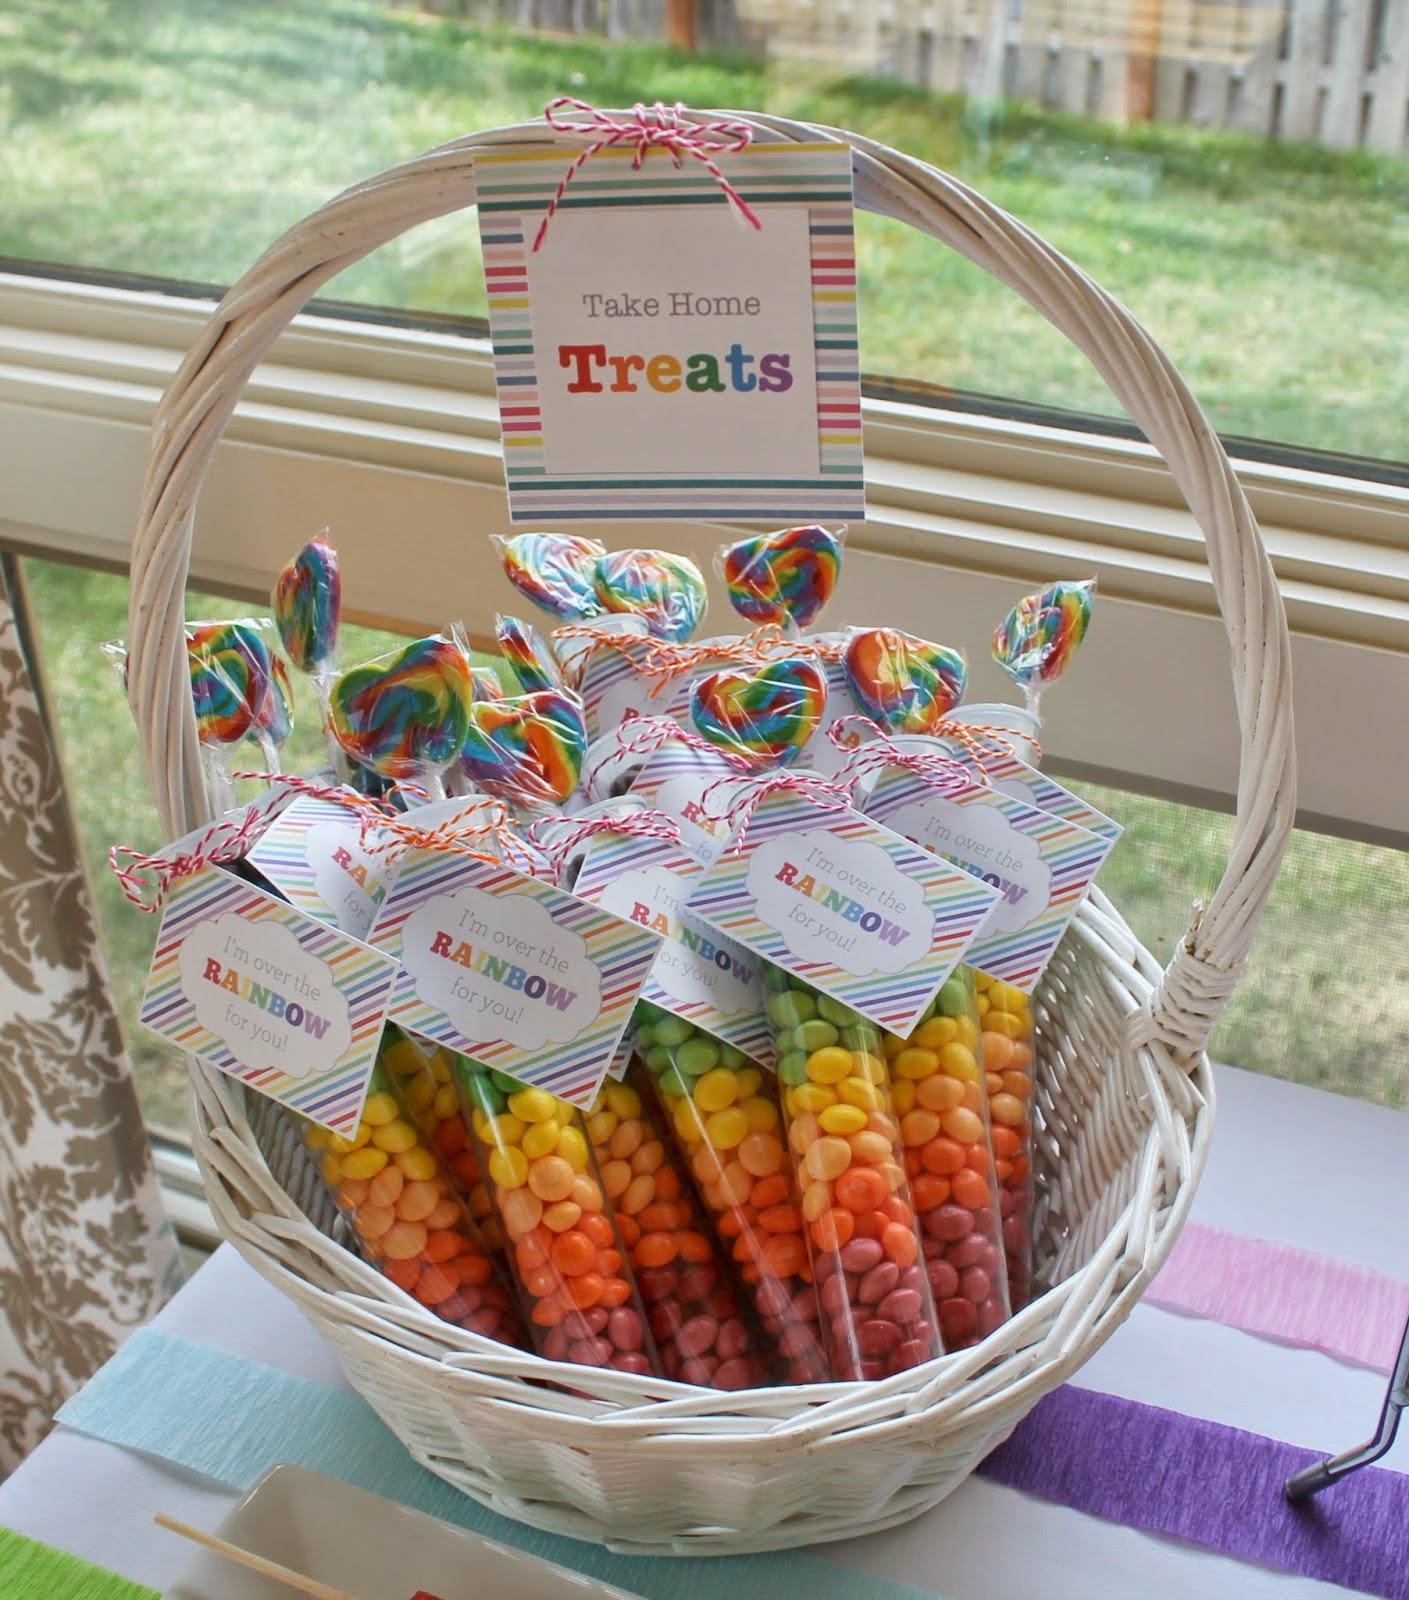 Rainbow+take+home+treats.jpg